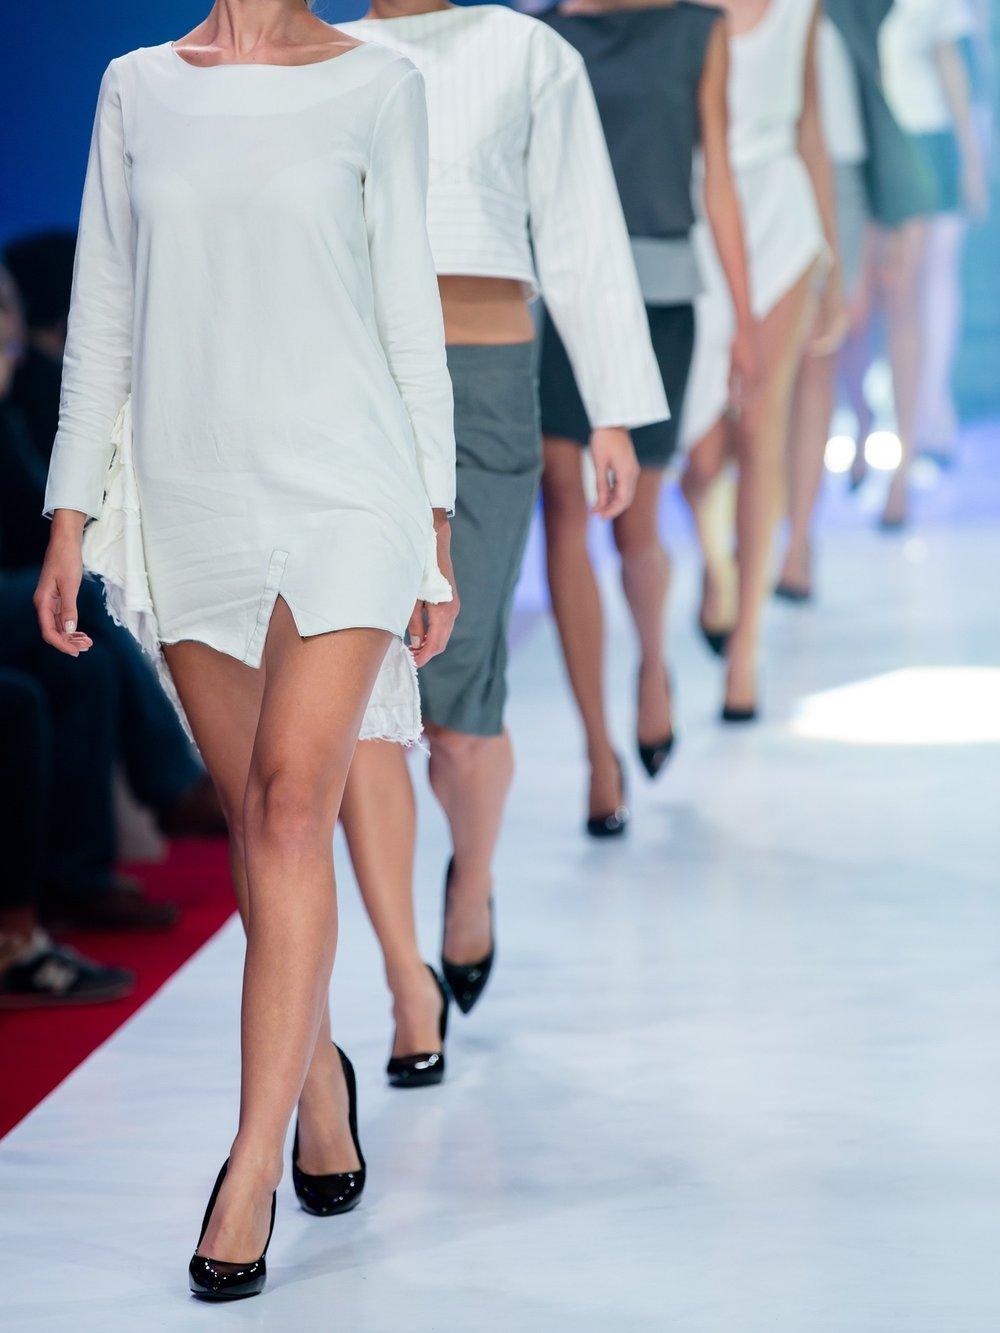 fashion-runway.jpg